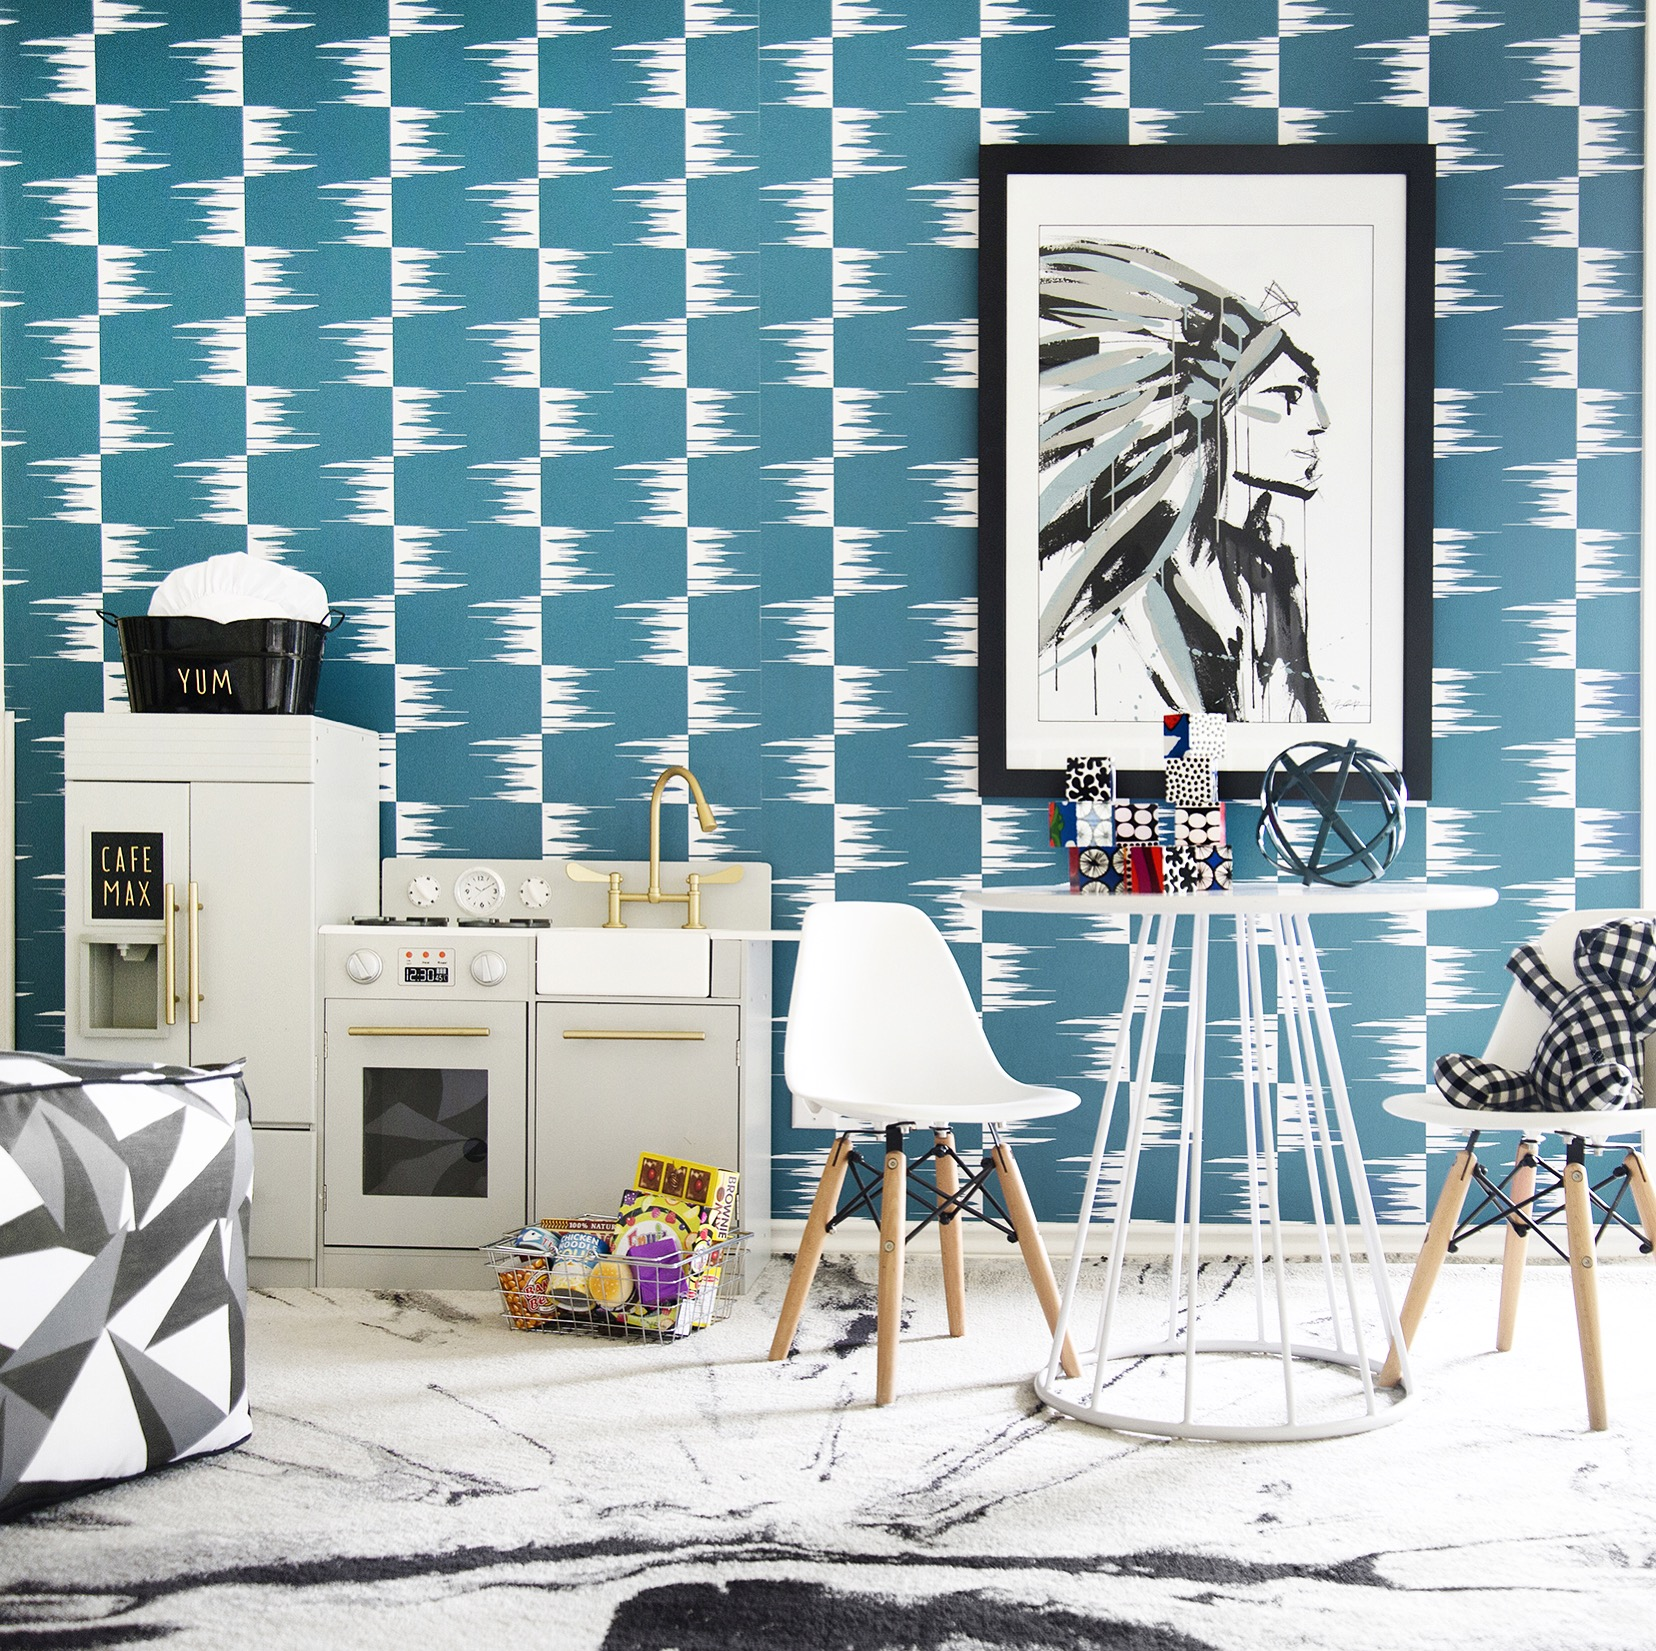 STONE TEXTILE FRINGE CHECK IN WHITE ON TEAL Designer: Stone Textile Studio